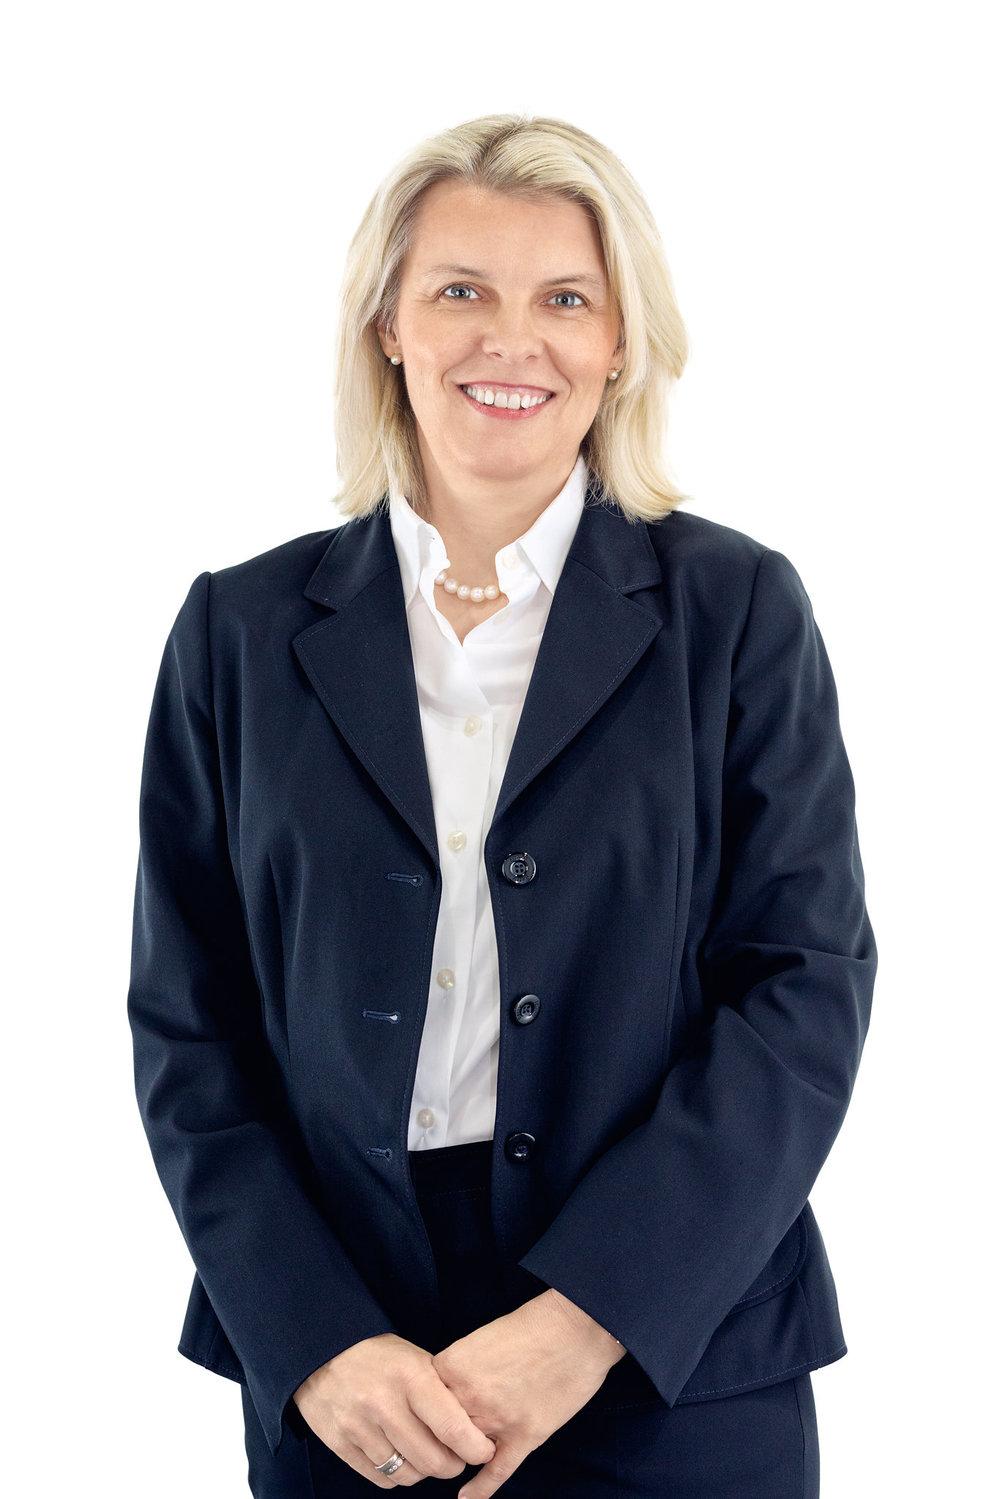 Reinhild Westmeyer, Marketing Director, EFI